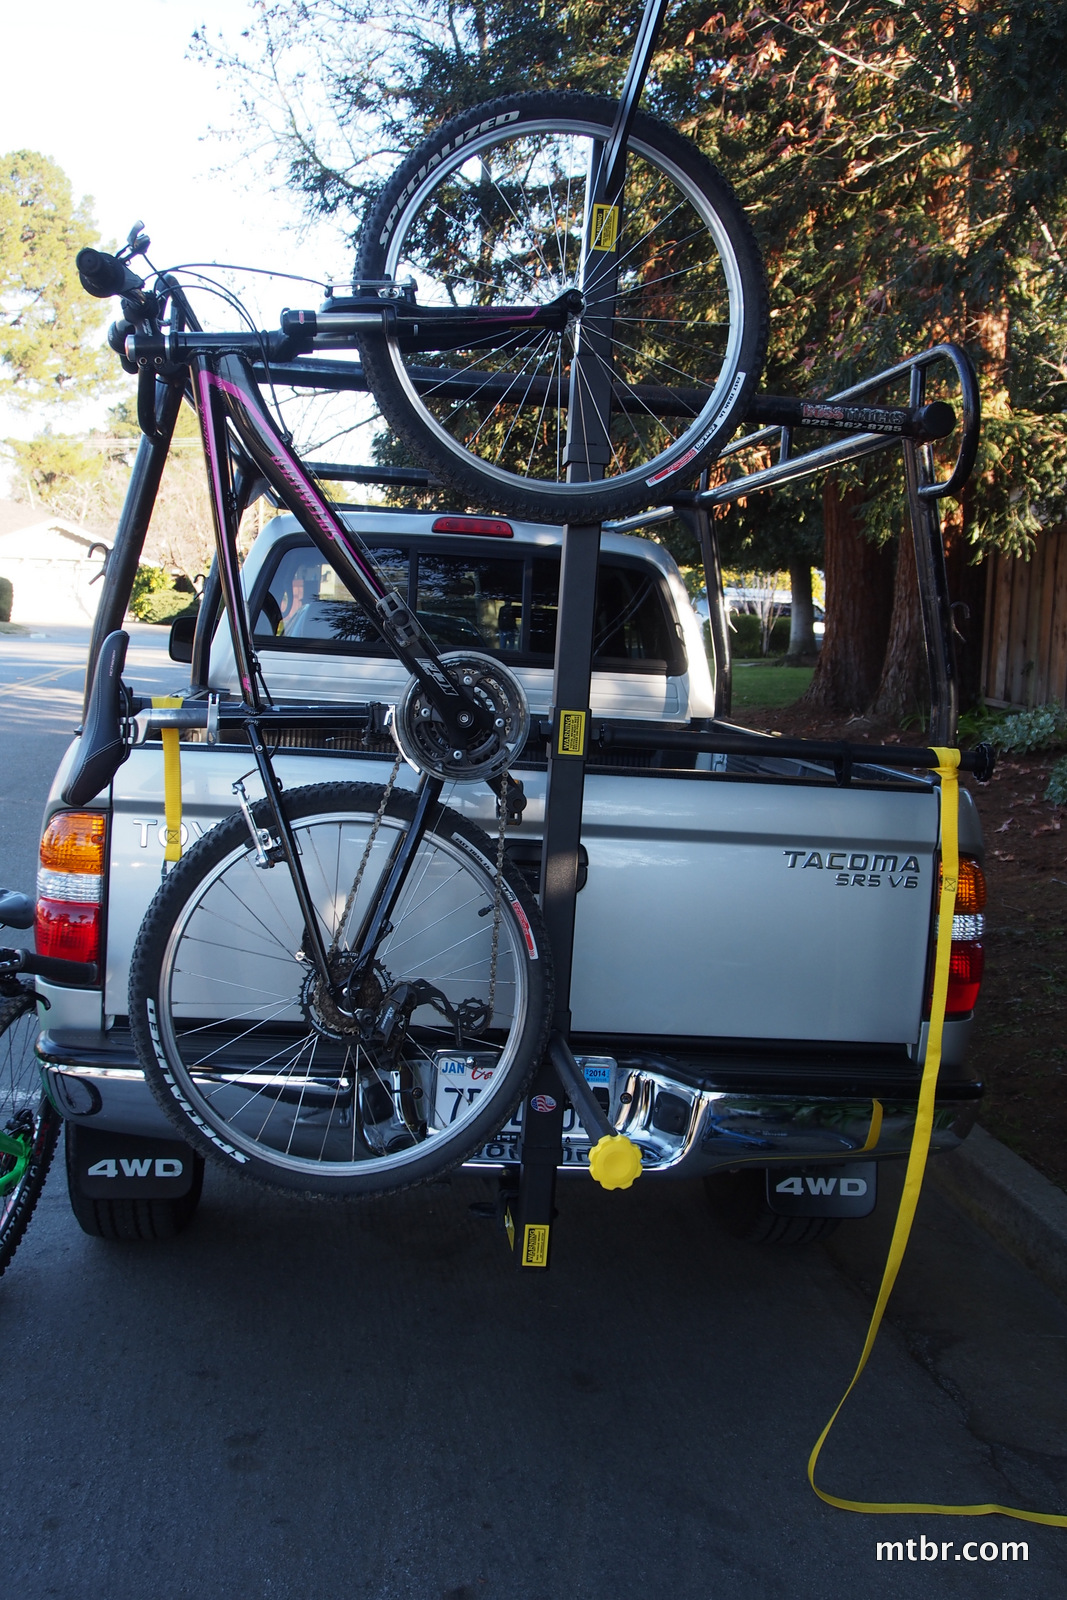 UpRight Designs Totem Pole Bike Rack